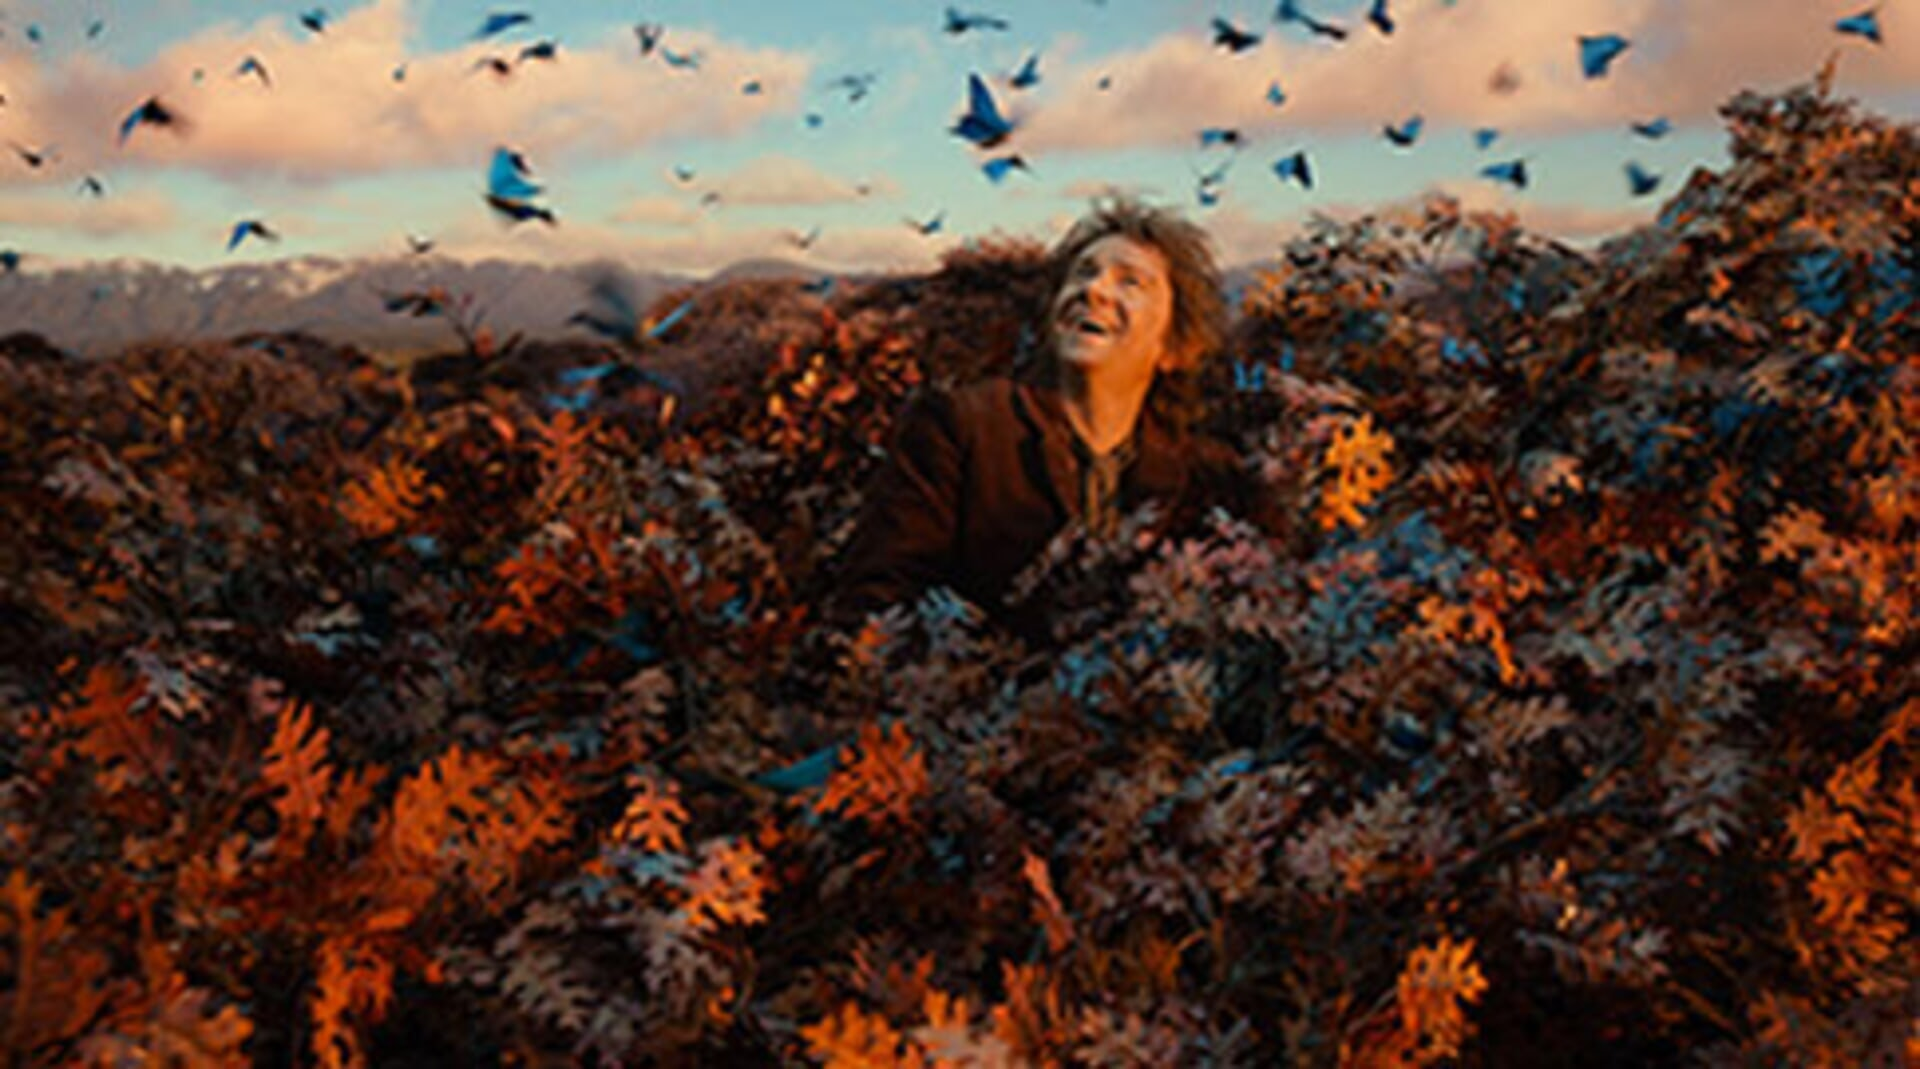 The Hobbit: The Desolation of Smaug - Image 35